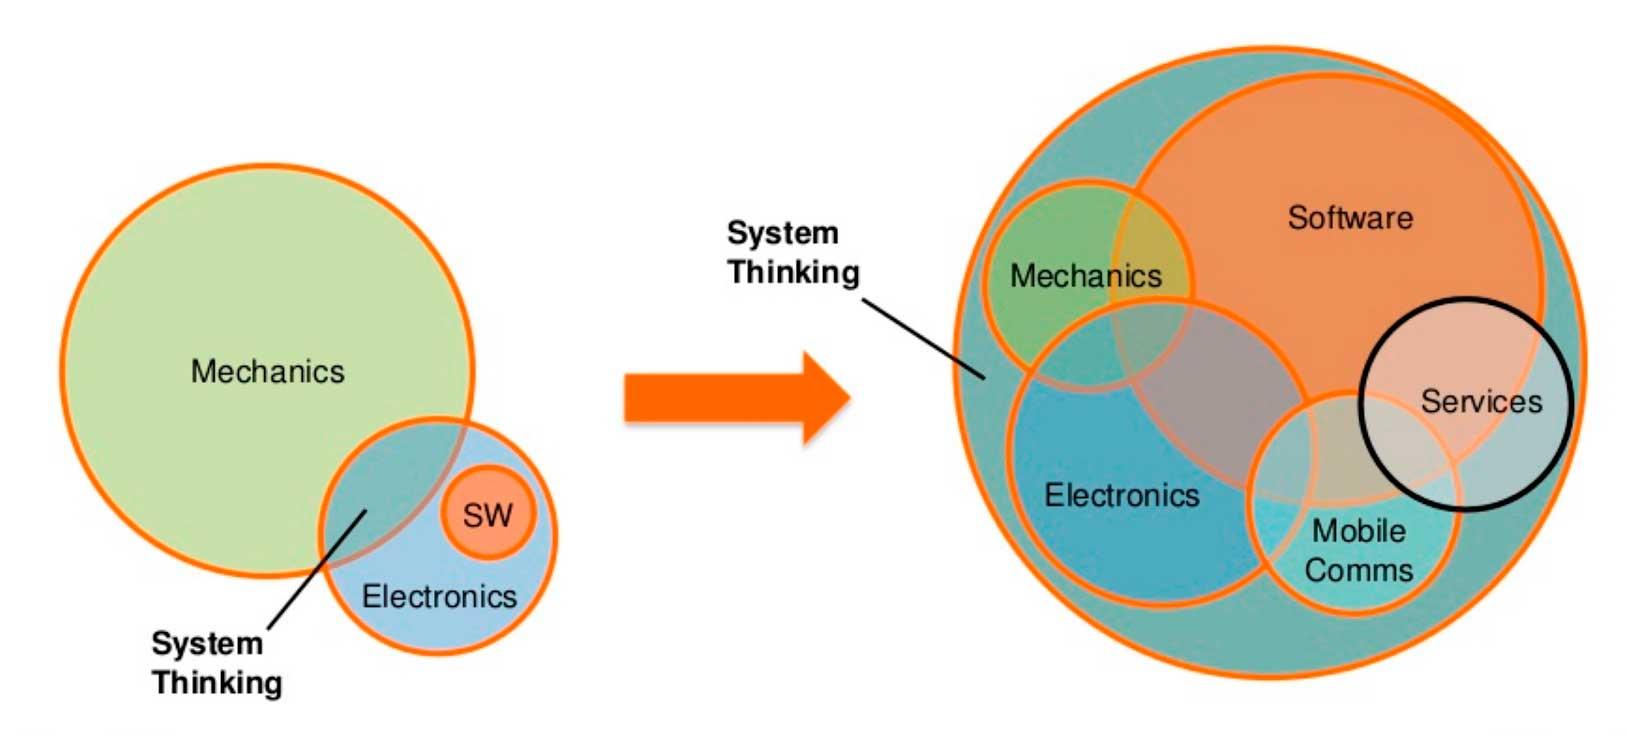 Software defined machines